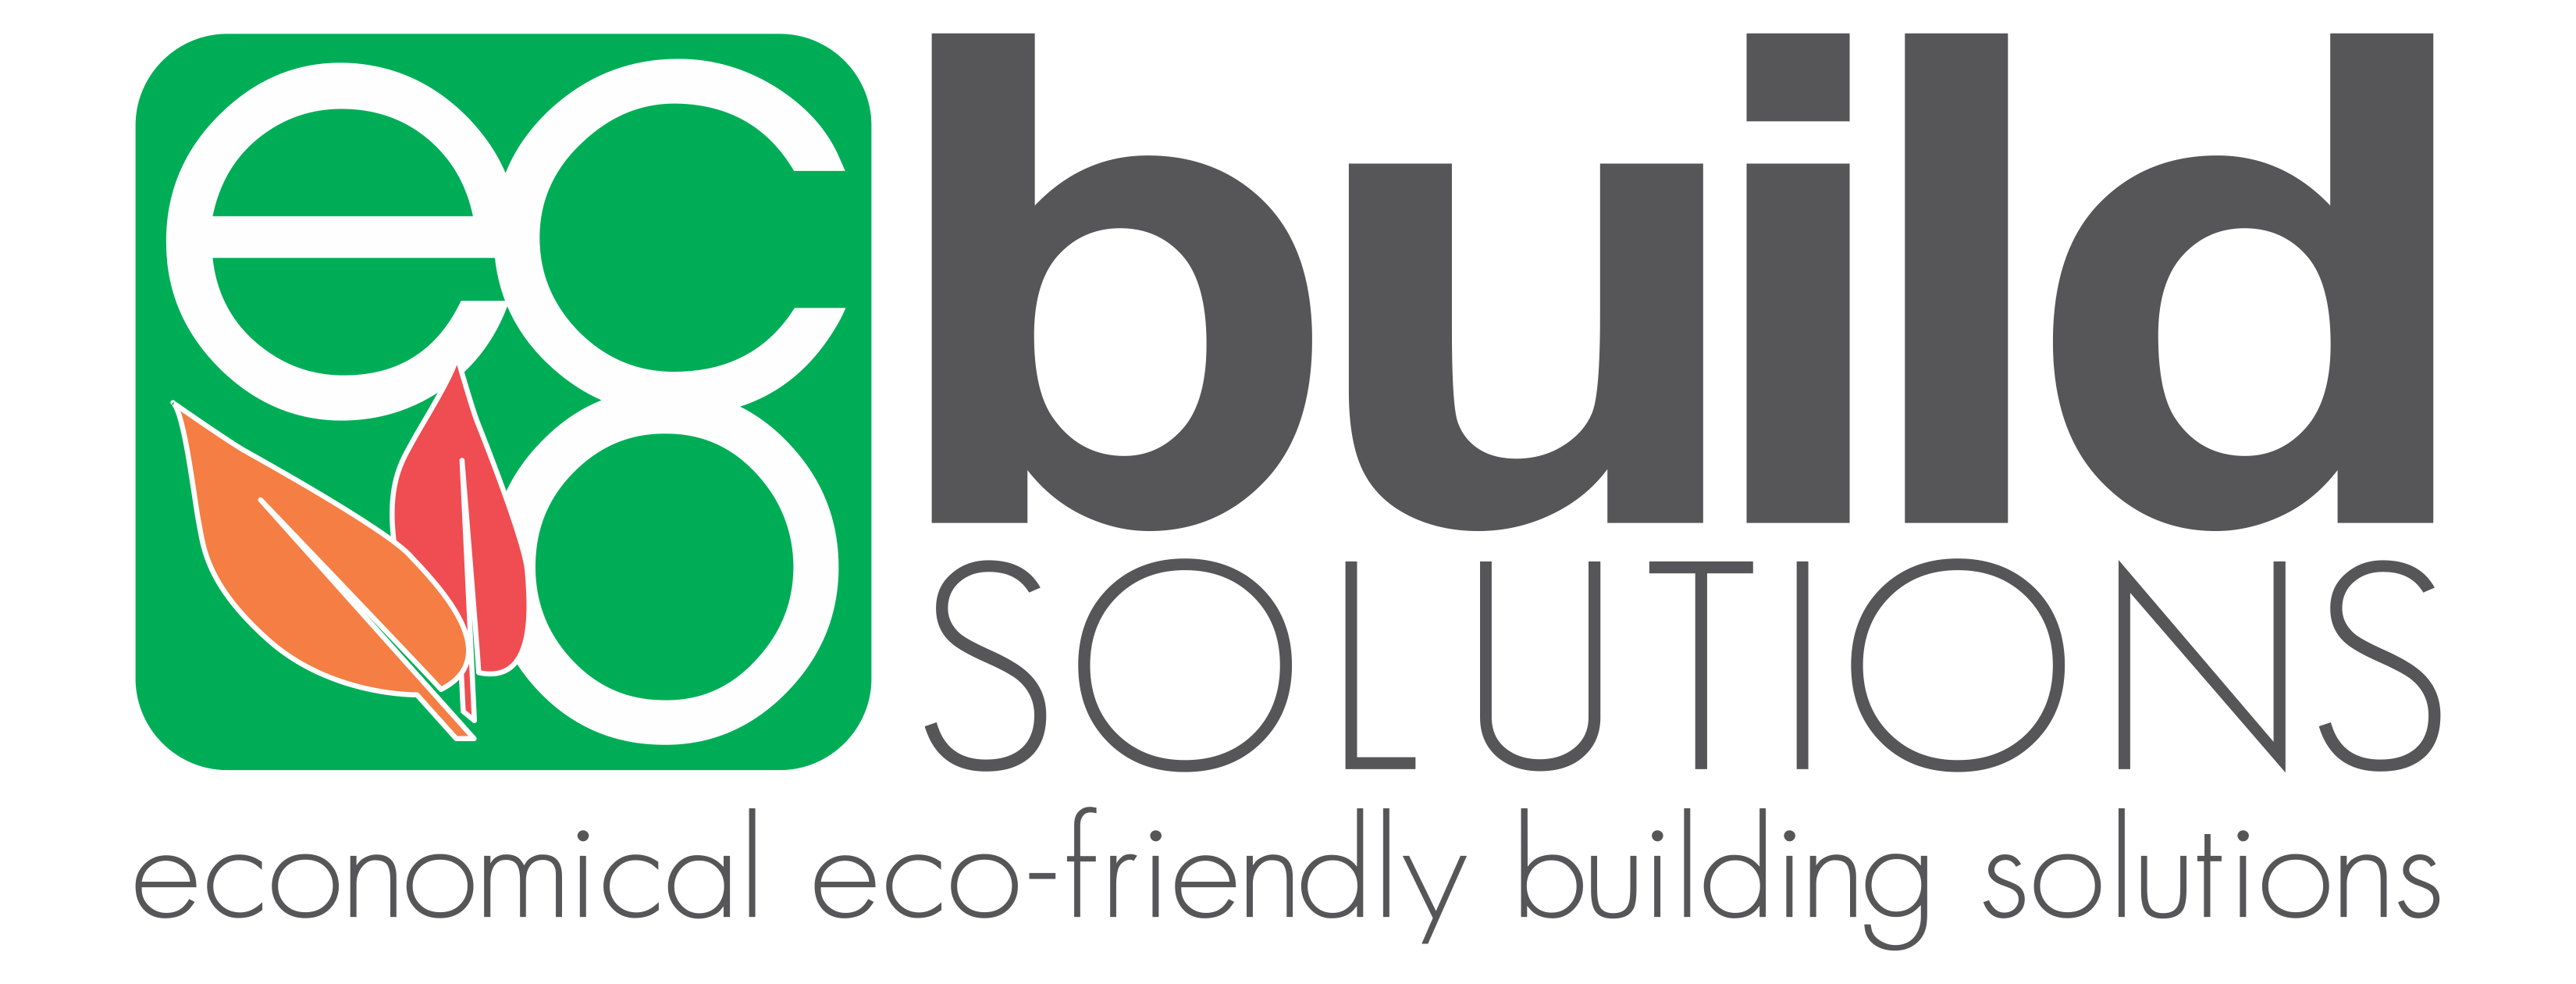 EcoBuild Solutions